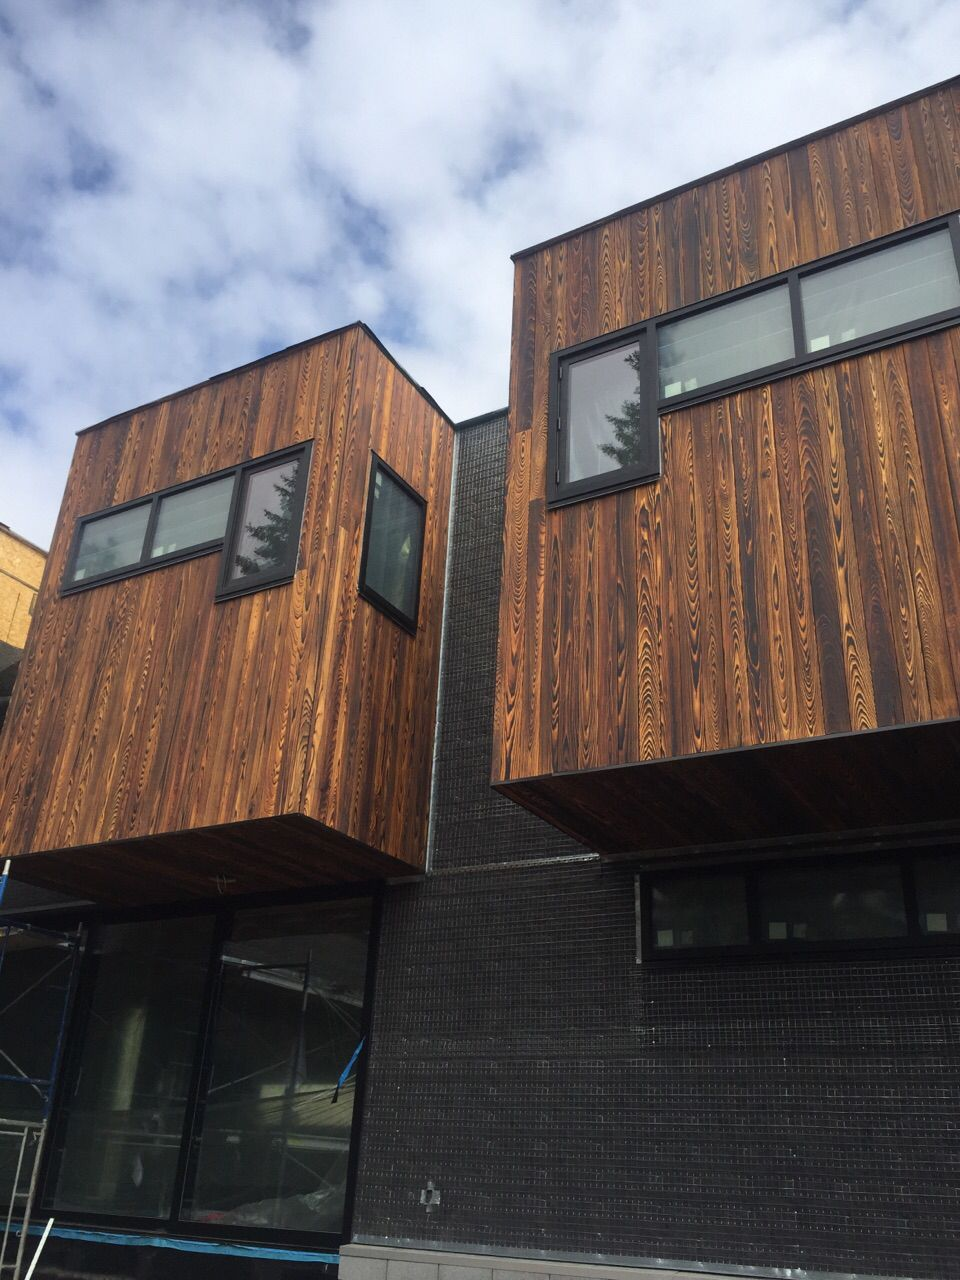 Tora Shou Sugi Ban Charred Wood Exterior Siding By Resawn